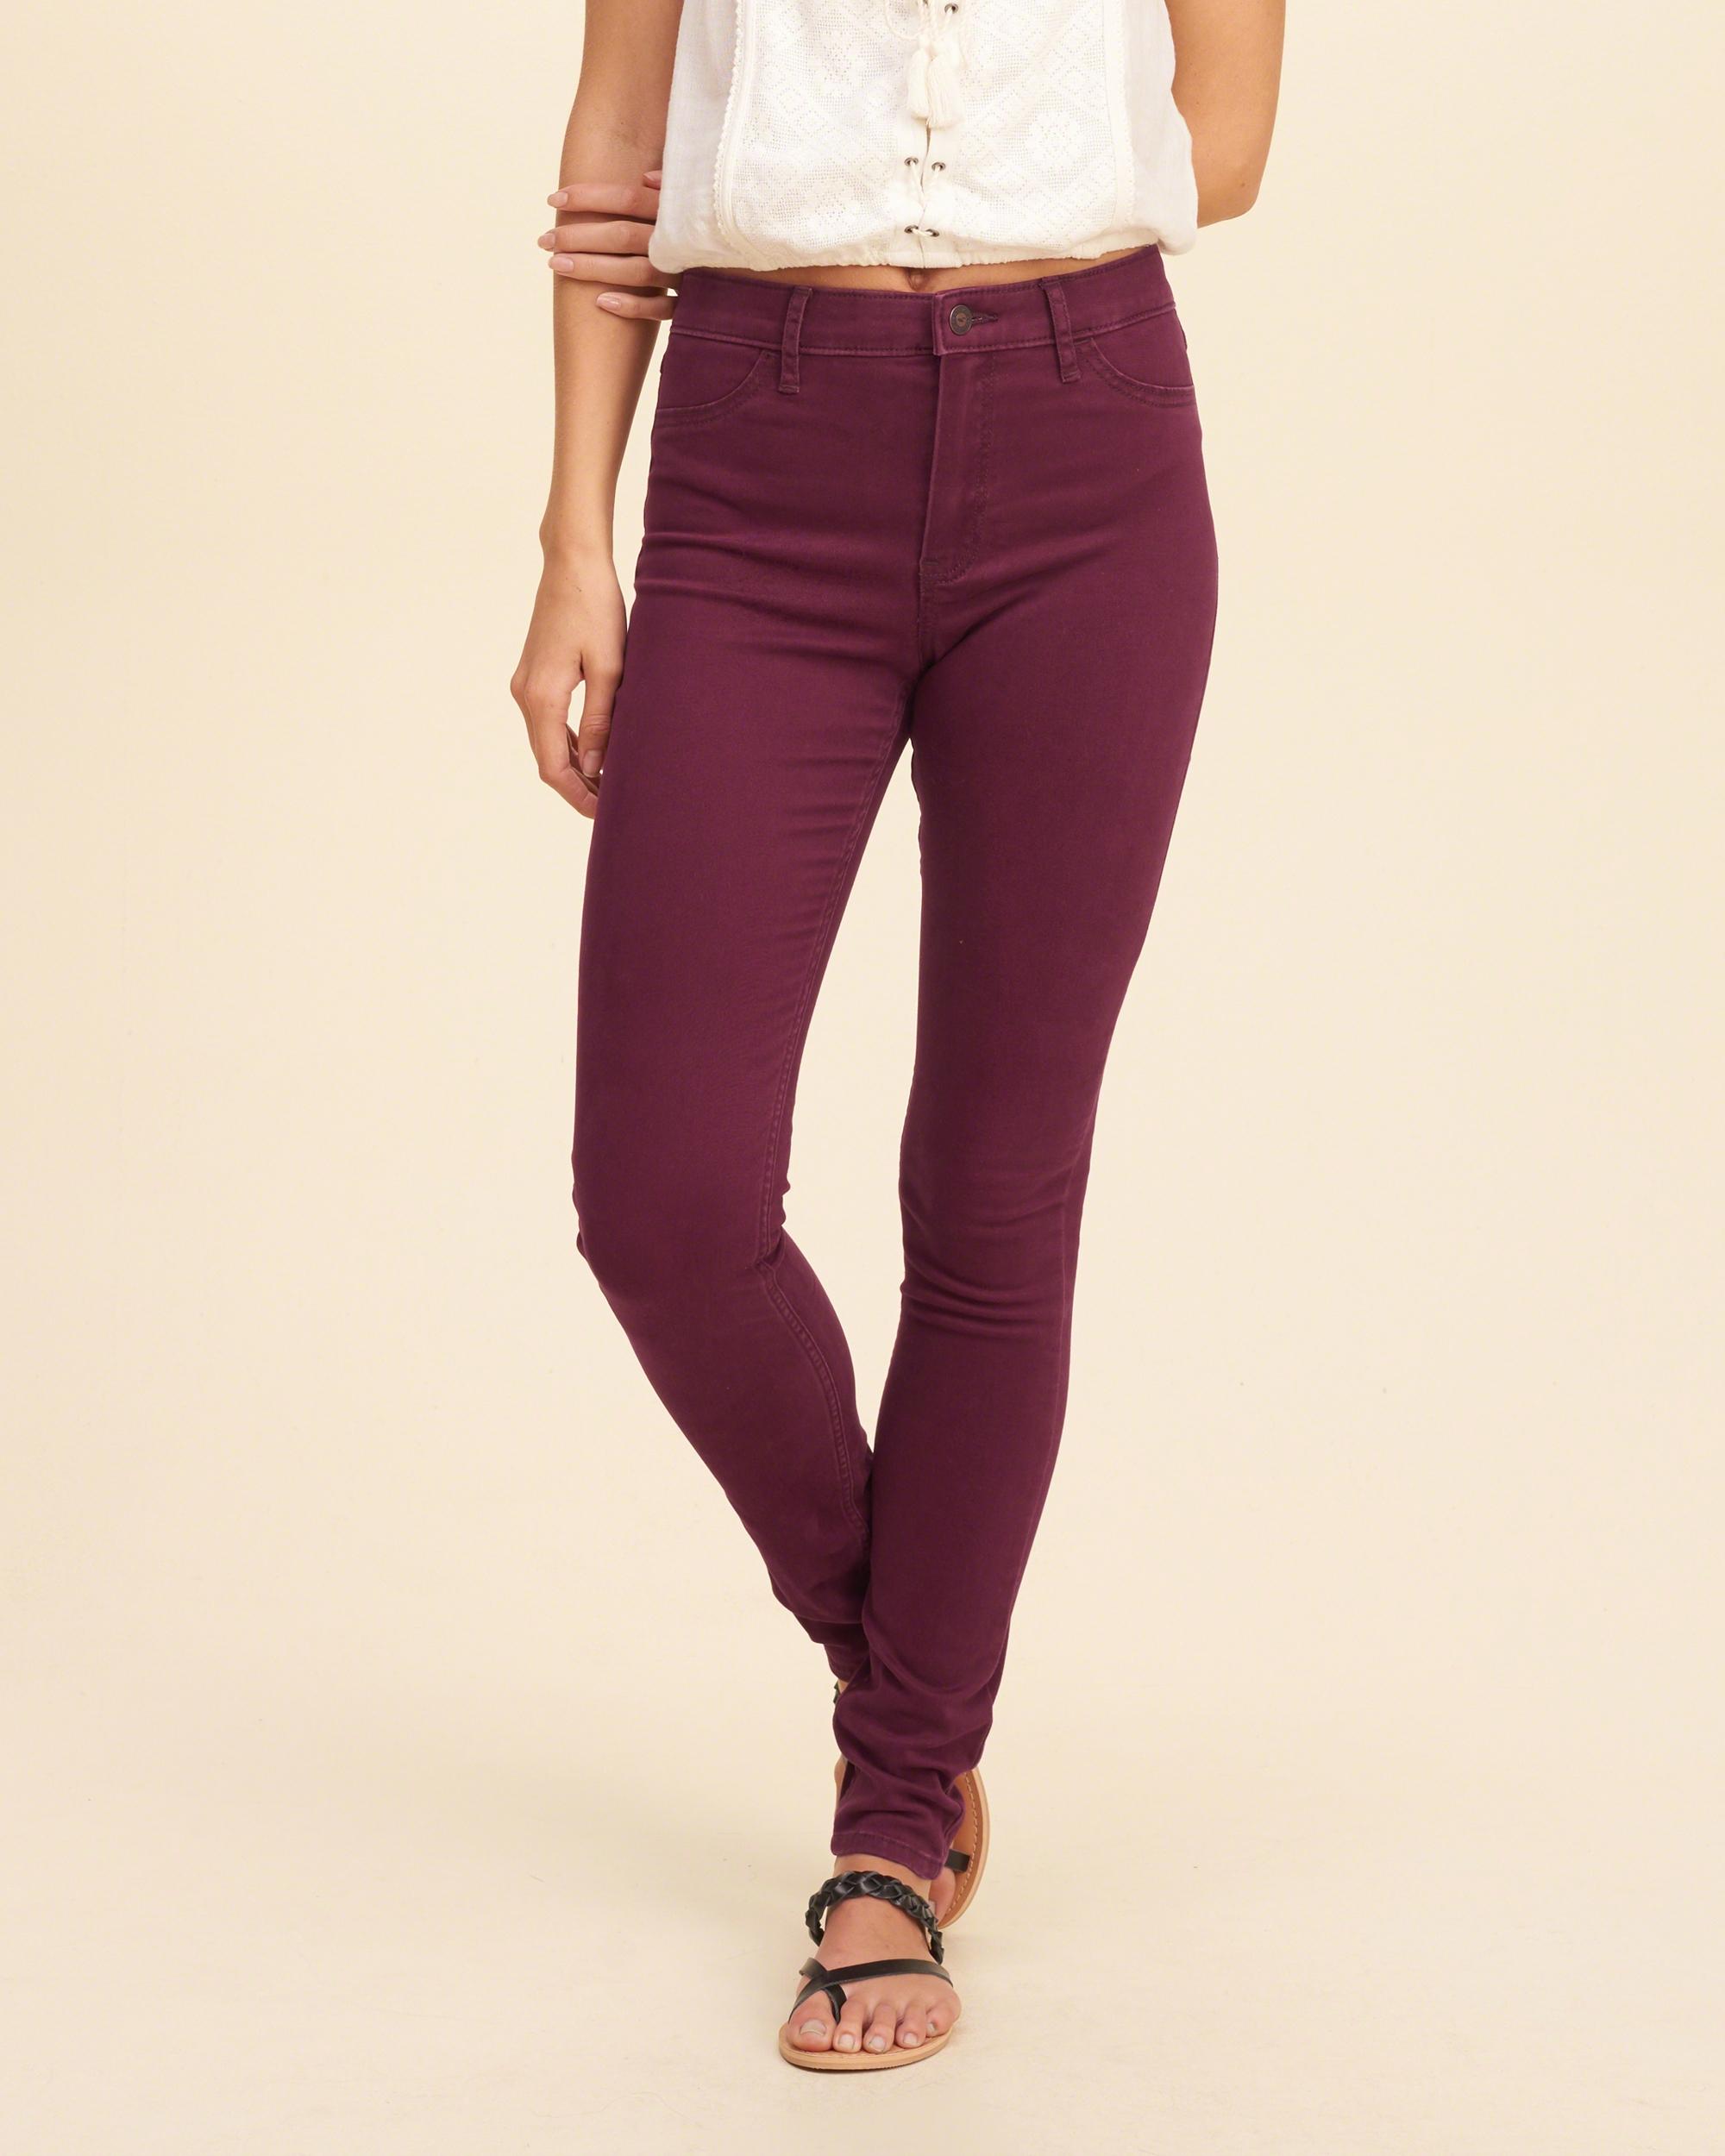 hollister school pants - photo #23